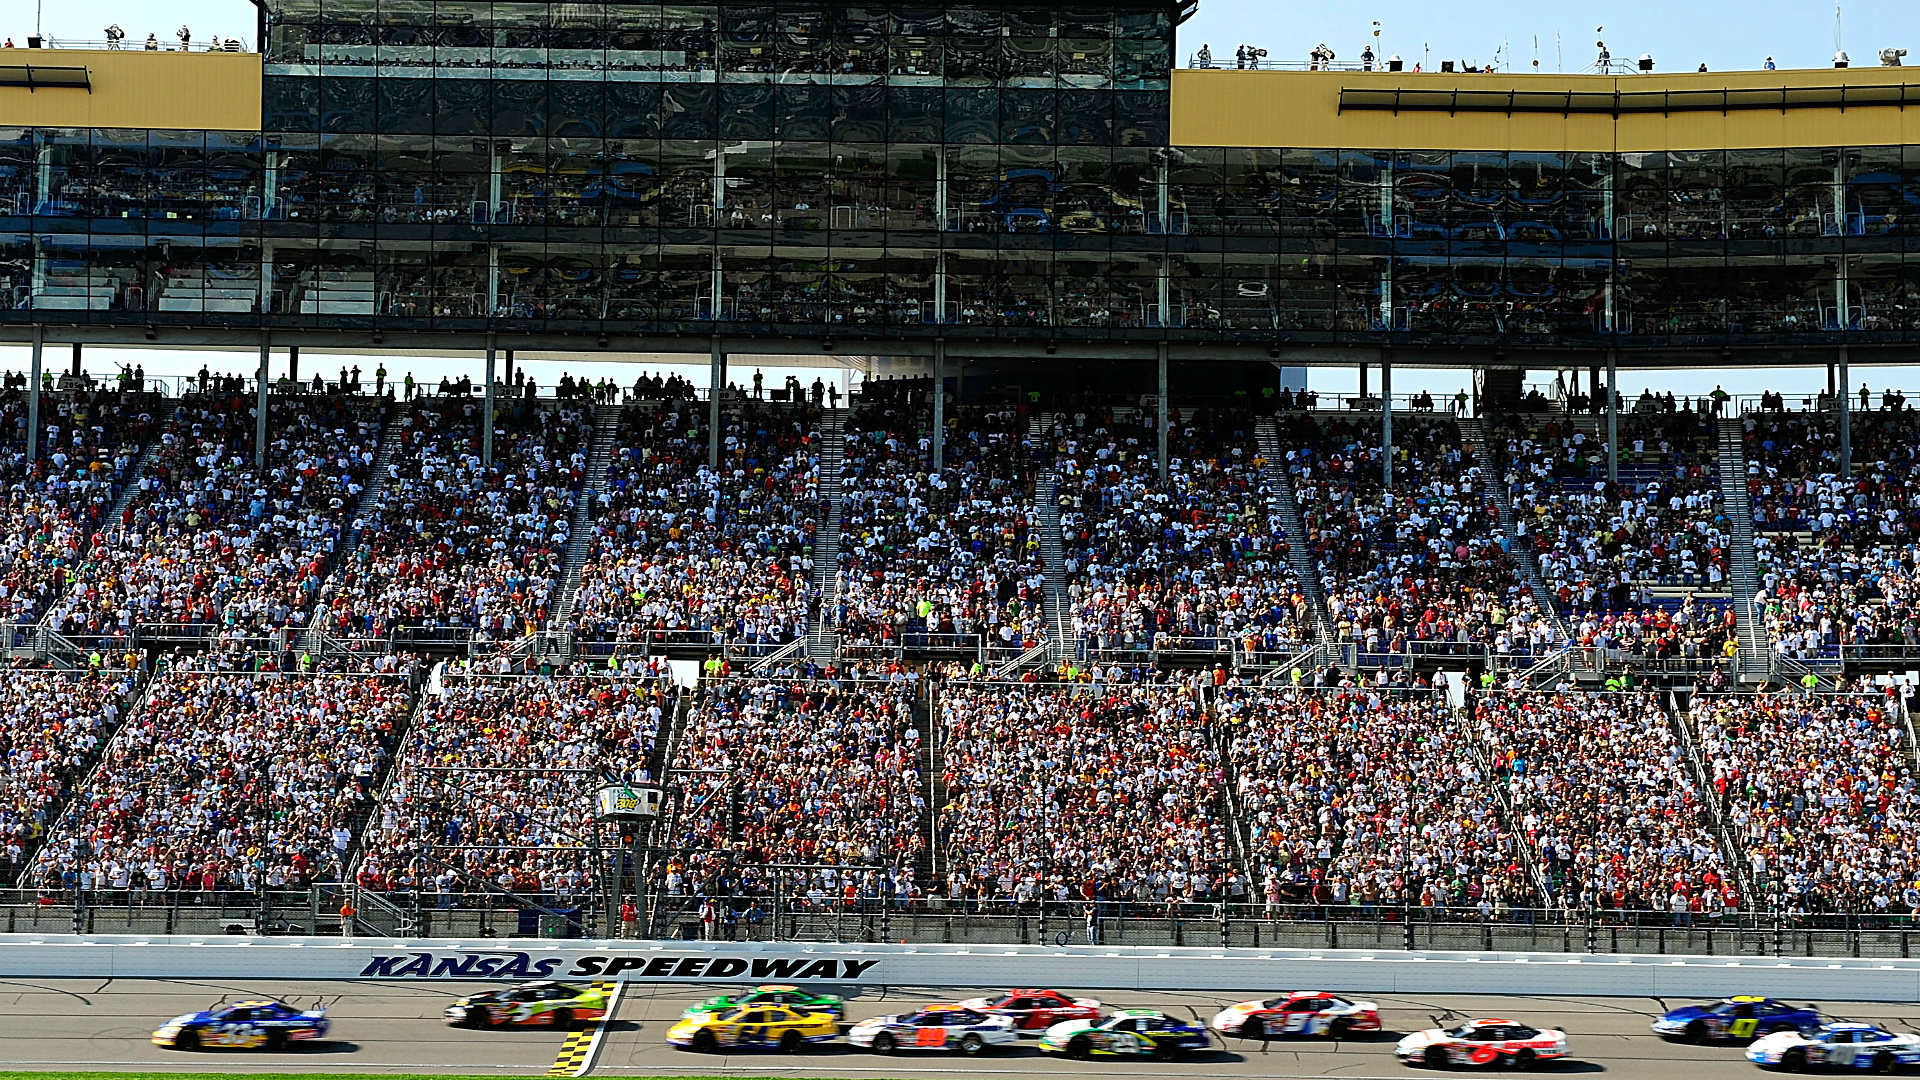 NASCAR at Kansas: Schedule, time, TV info, entry list